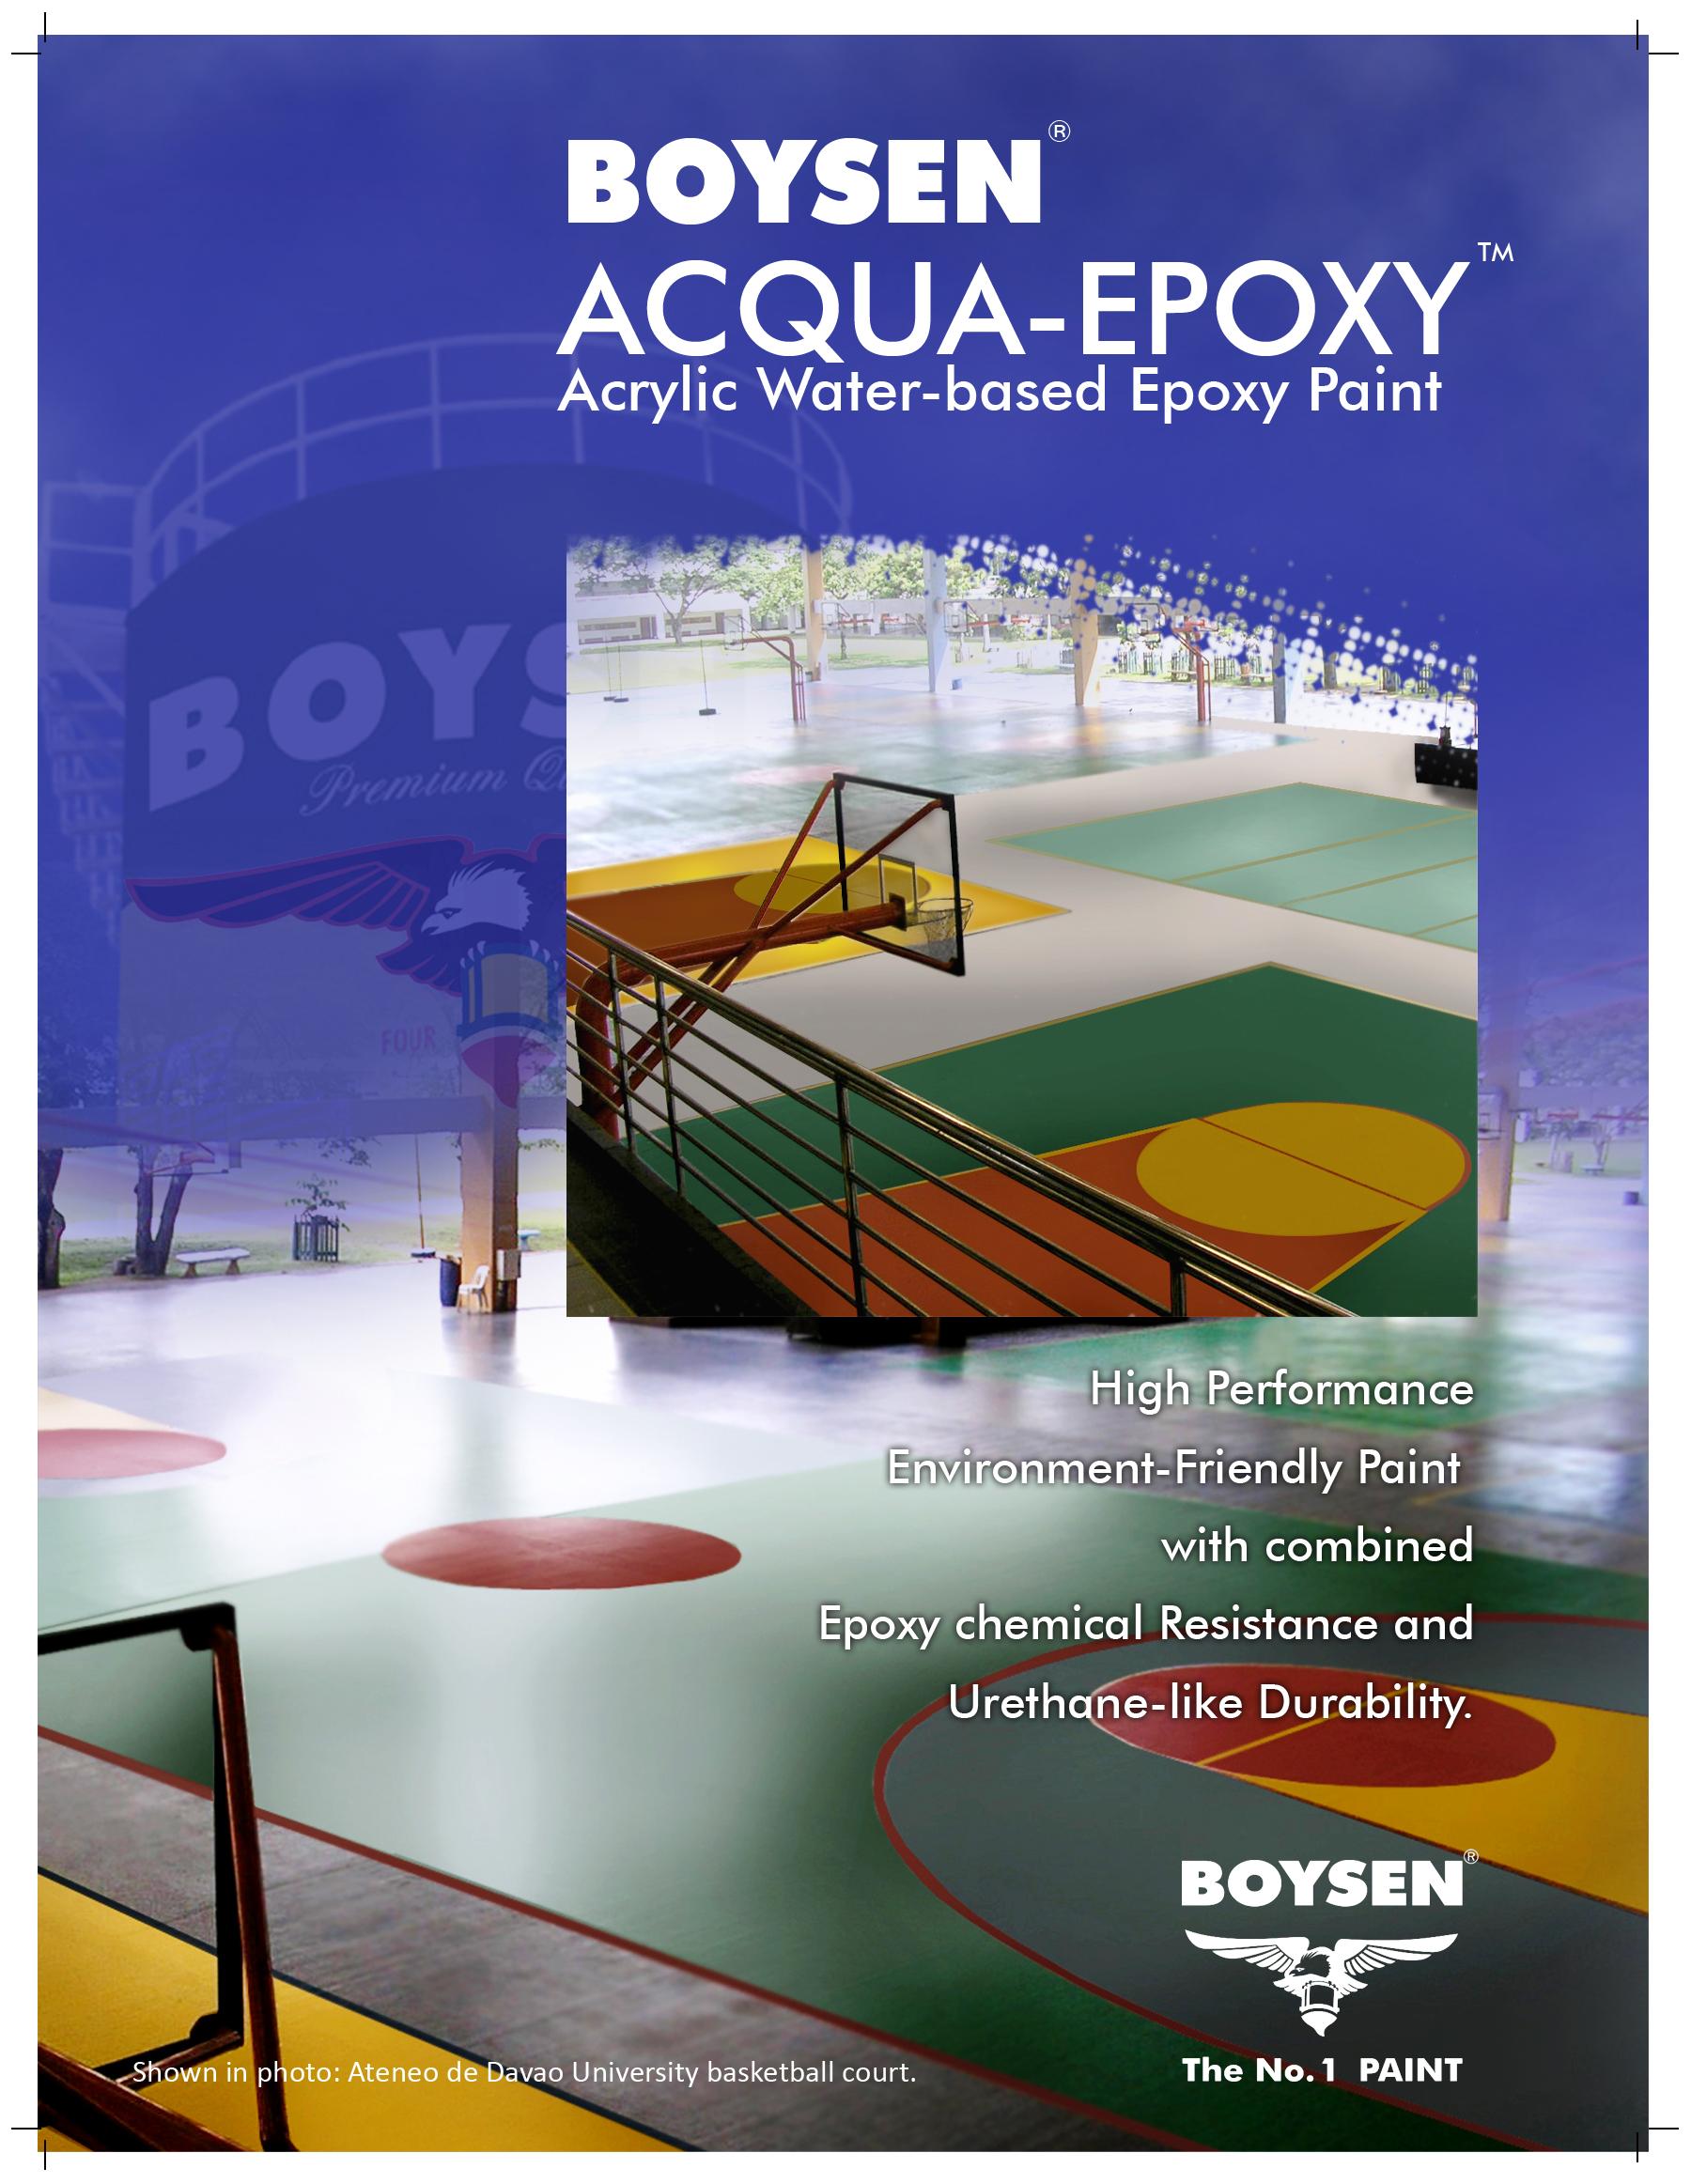 Pacific Paint Boysen Phils New Design Inc Acqua